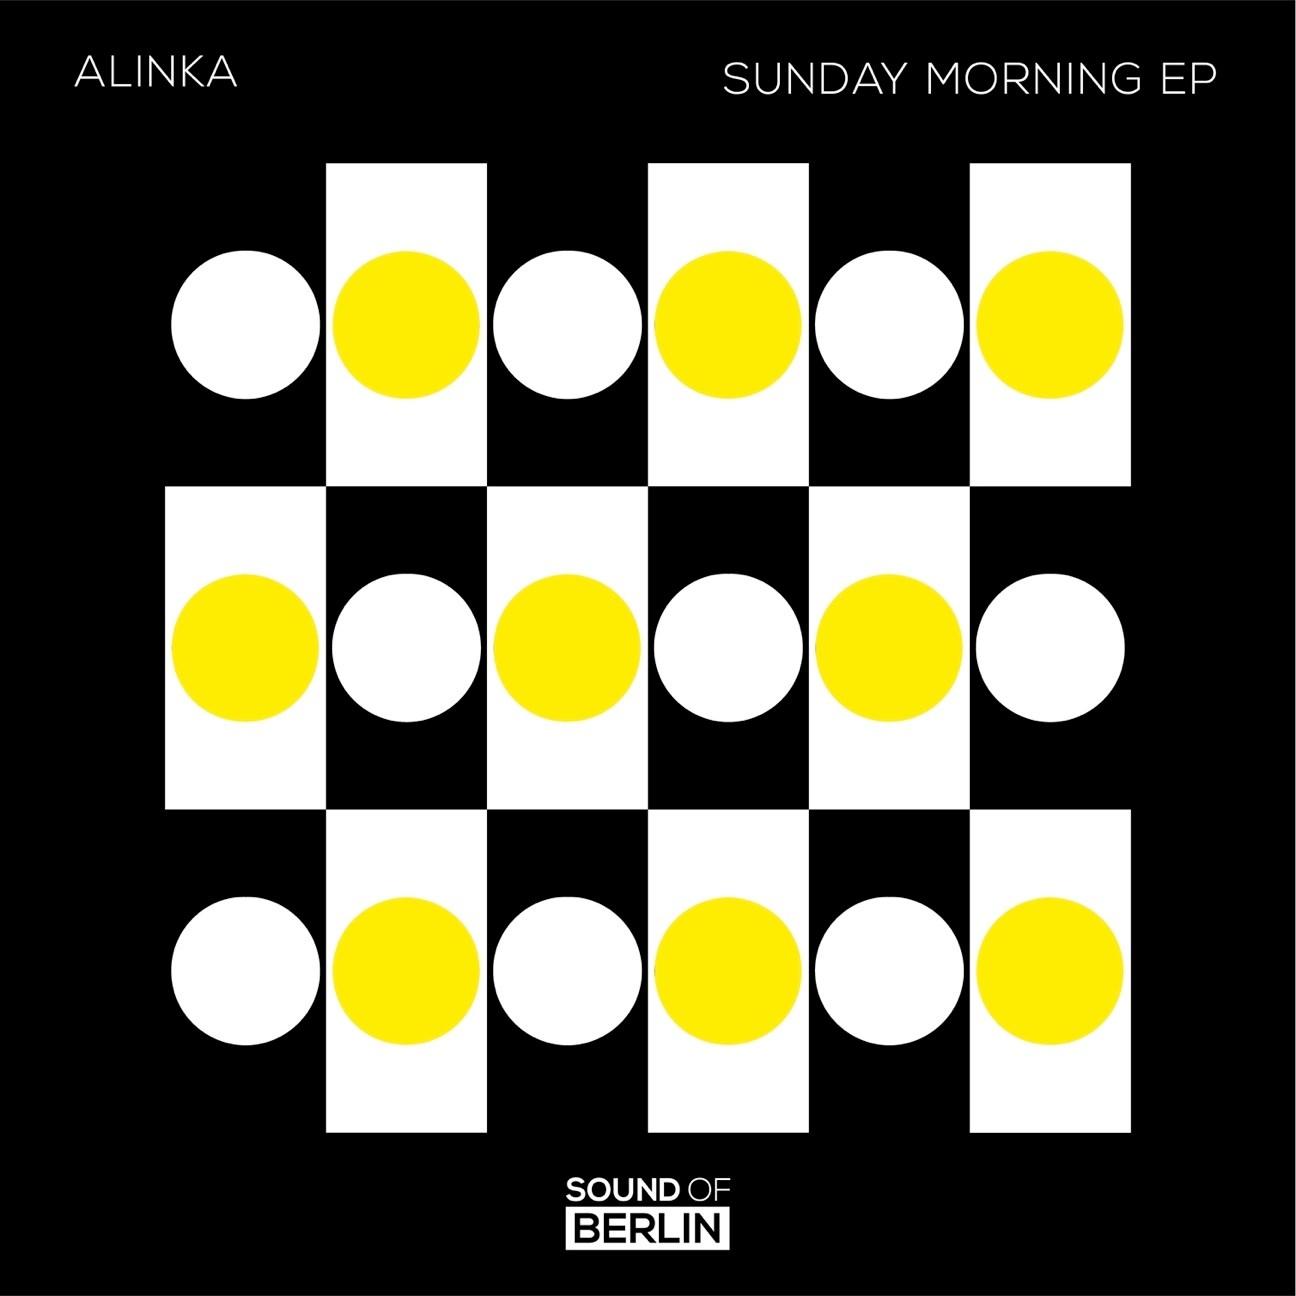 ALINKA_SUNDAYMORNING_ARTWORK